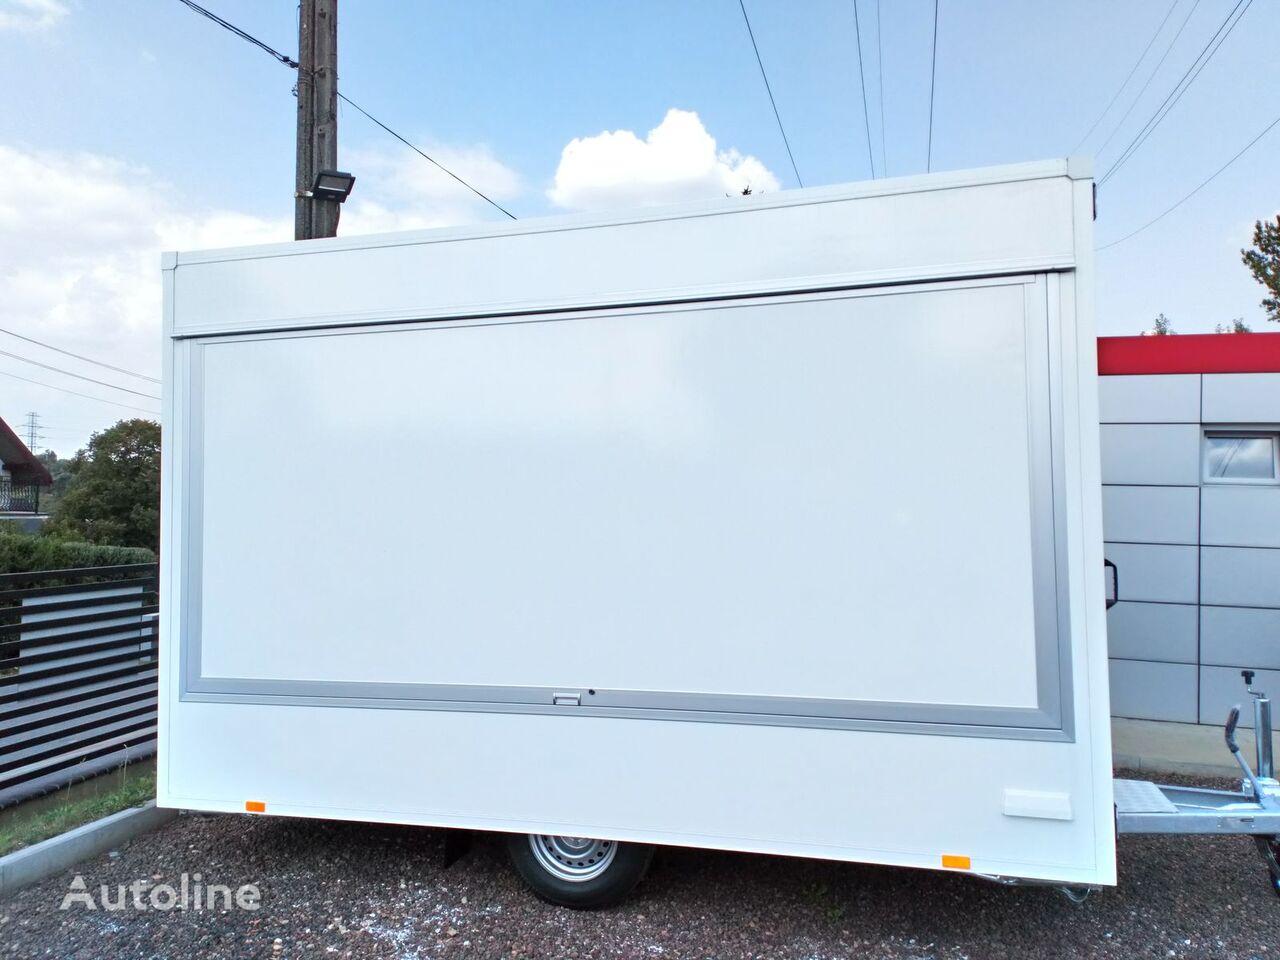 nova BANNERT W MAGAZYNIE 3 szt.  3,7 m Food Truck, Imbiss, Handlowa, Piekarni prodajna prikolica